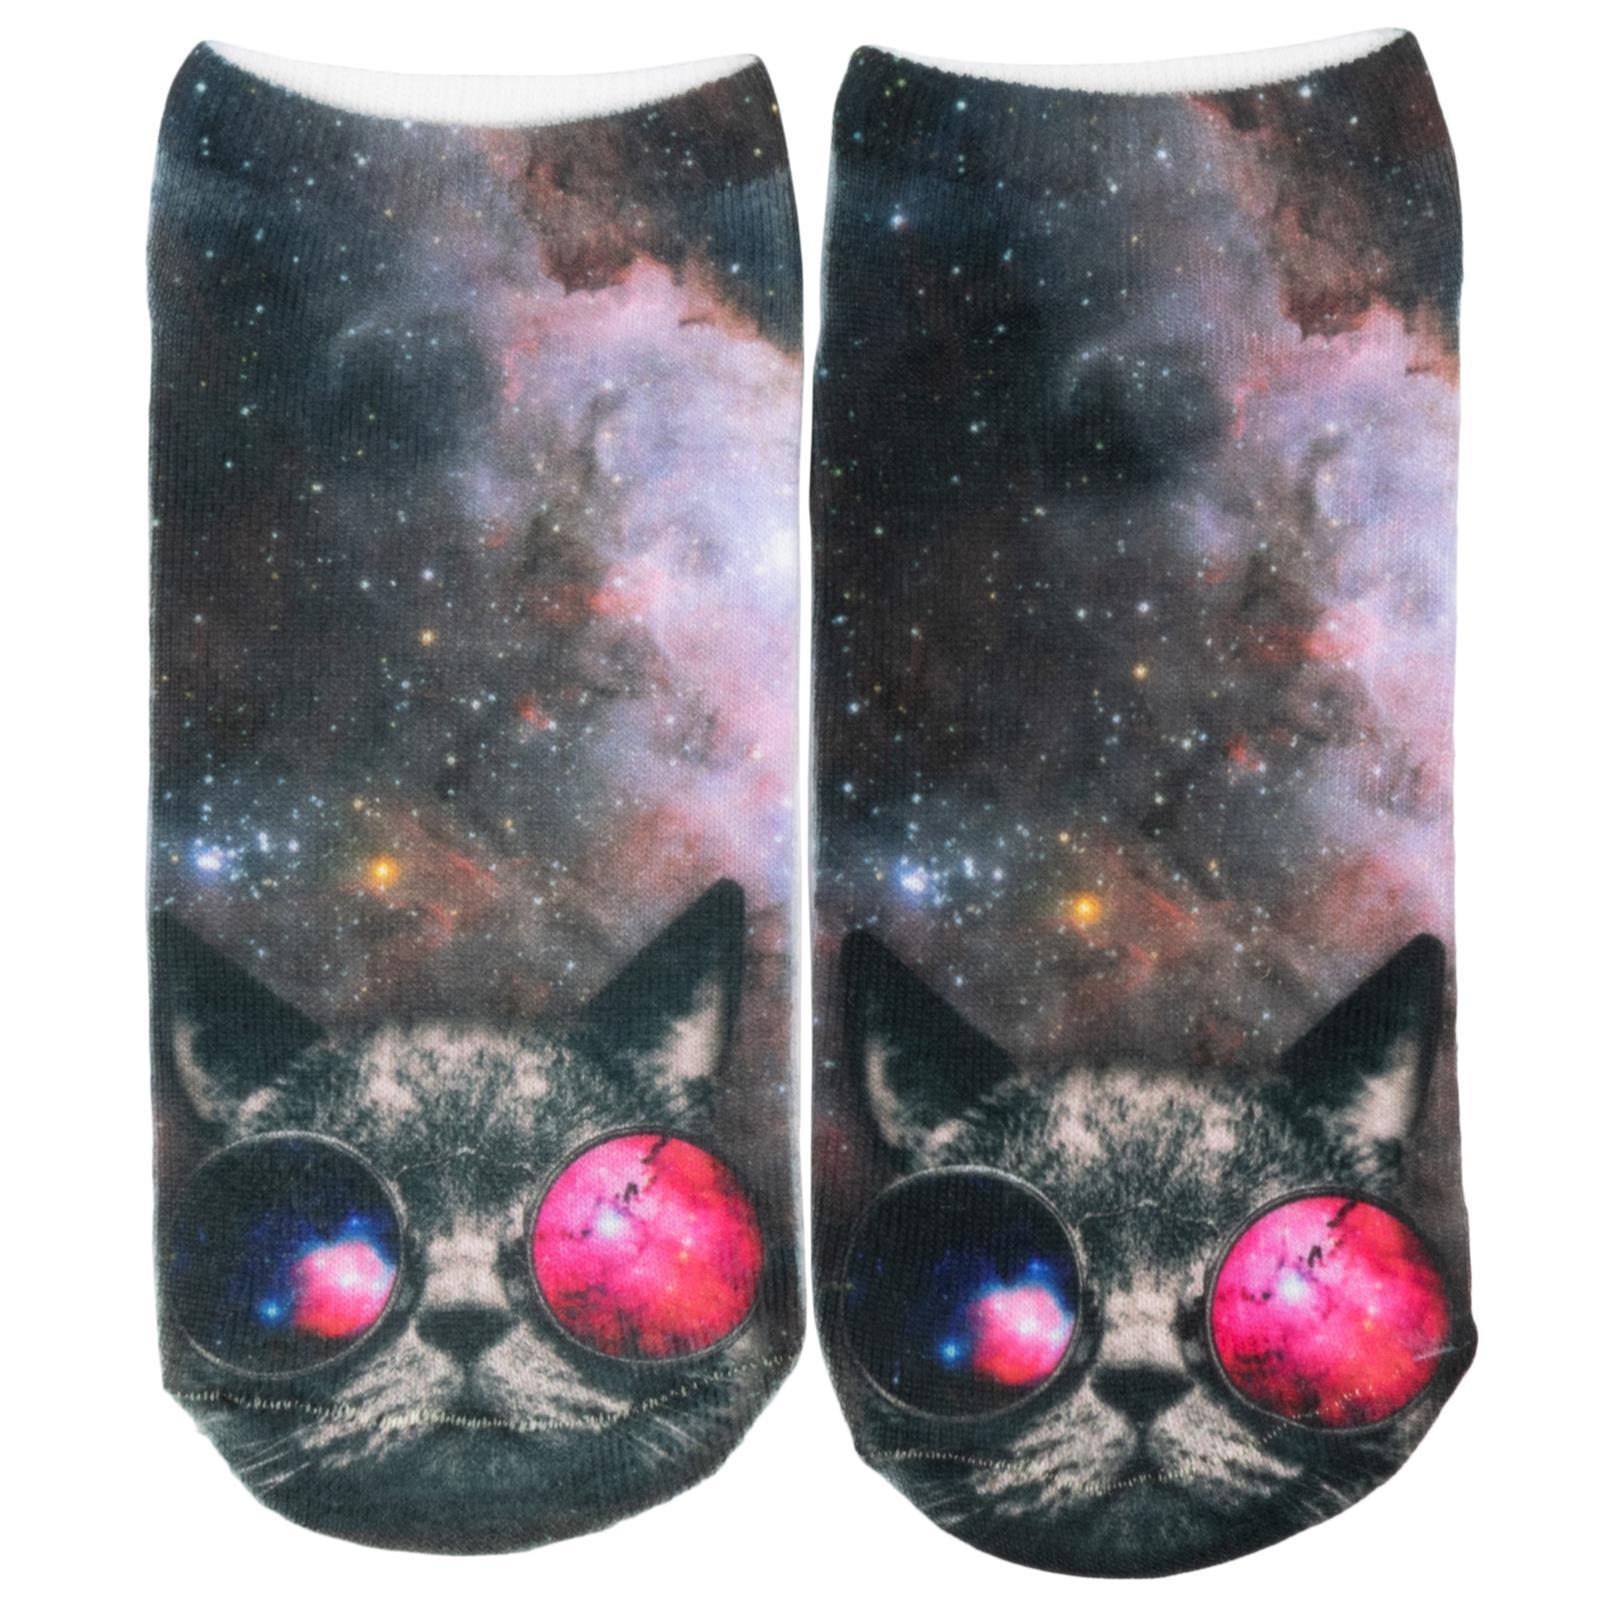 Cosey – 1 Paia Sneaker Calzini Breve Polarzip – Space Cat – Flexigröße 33-40-